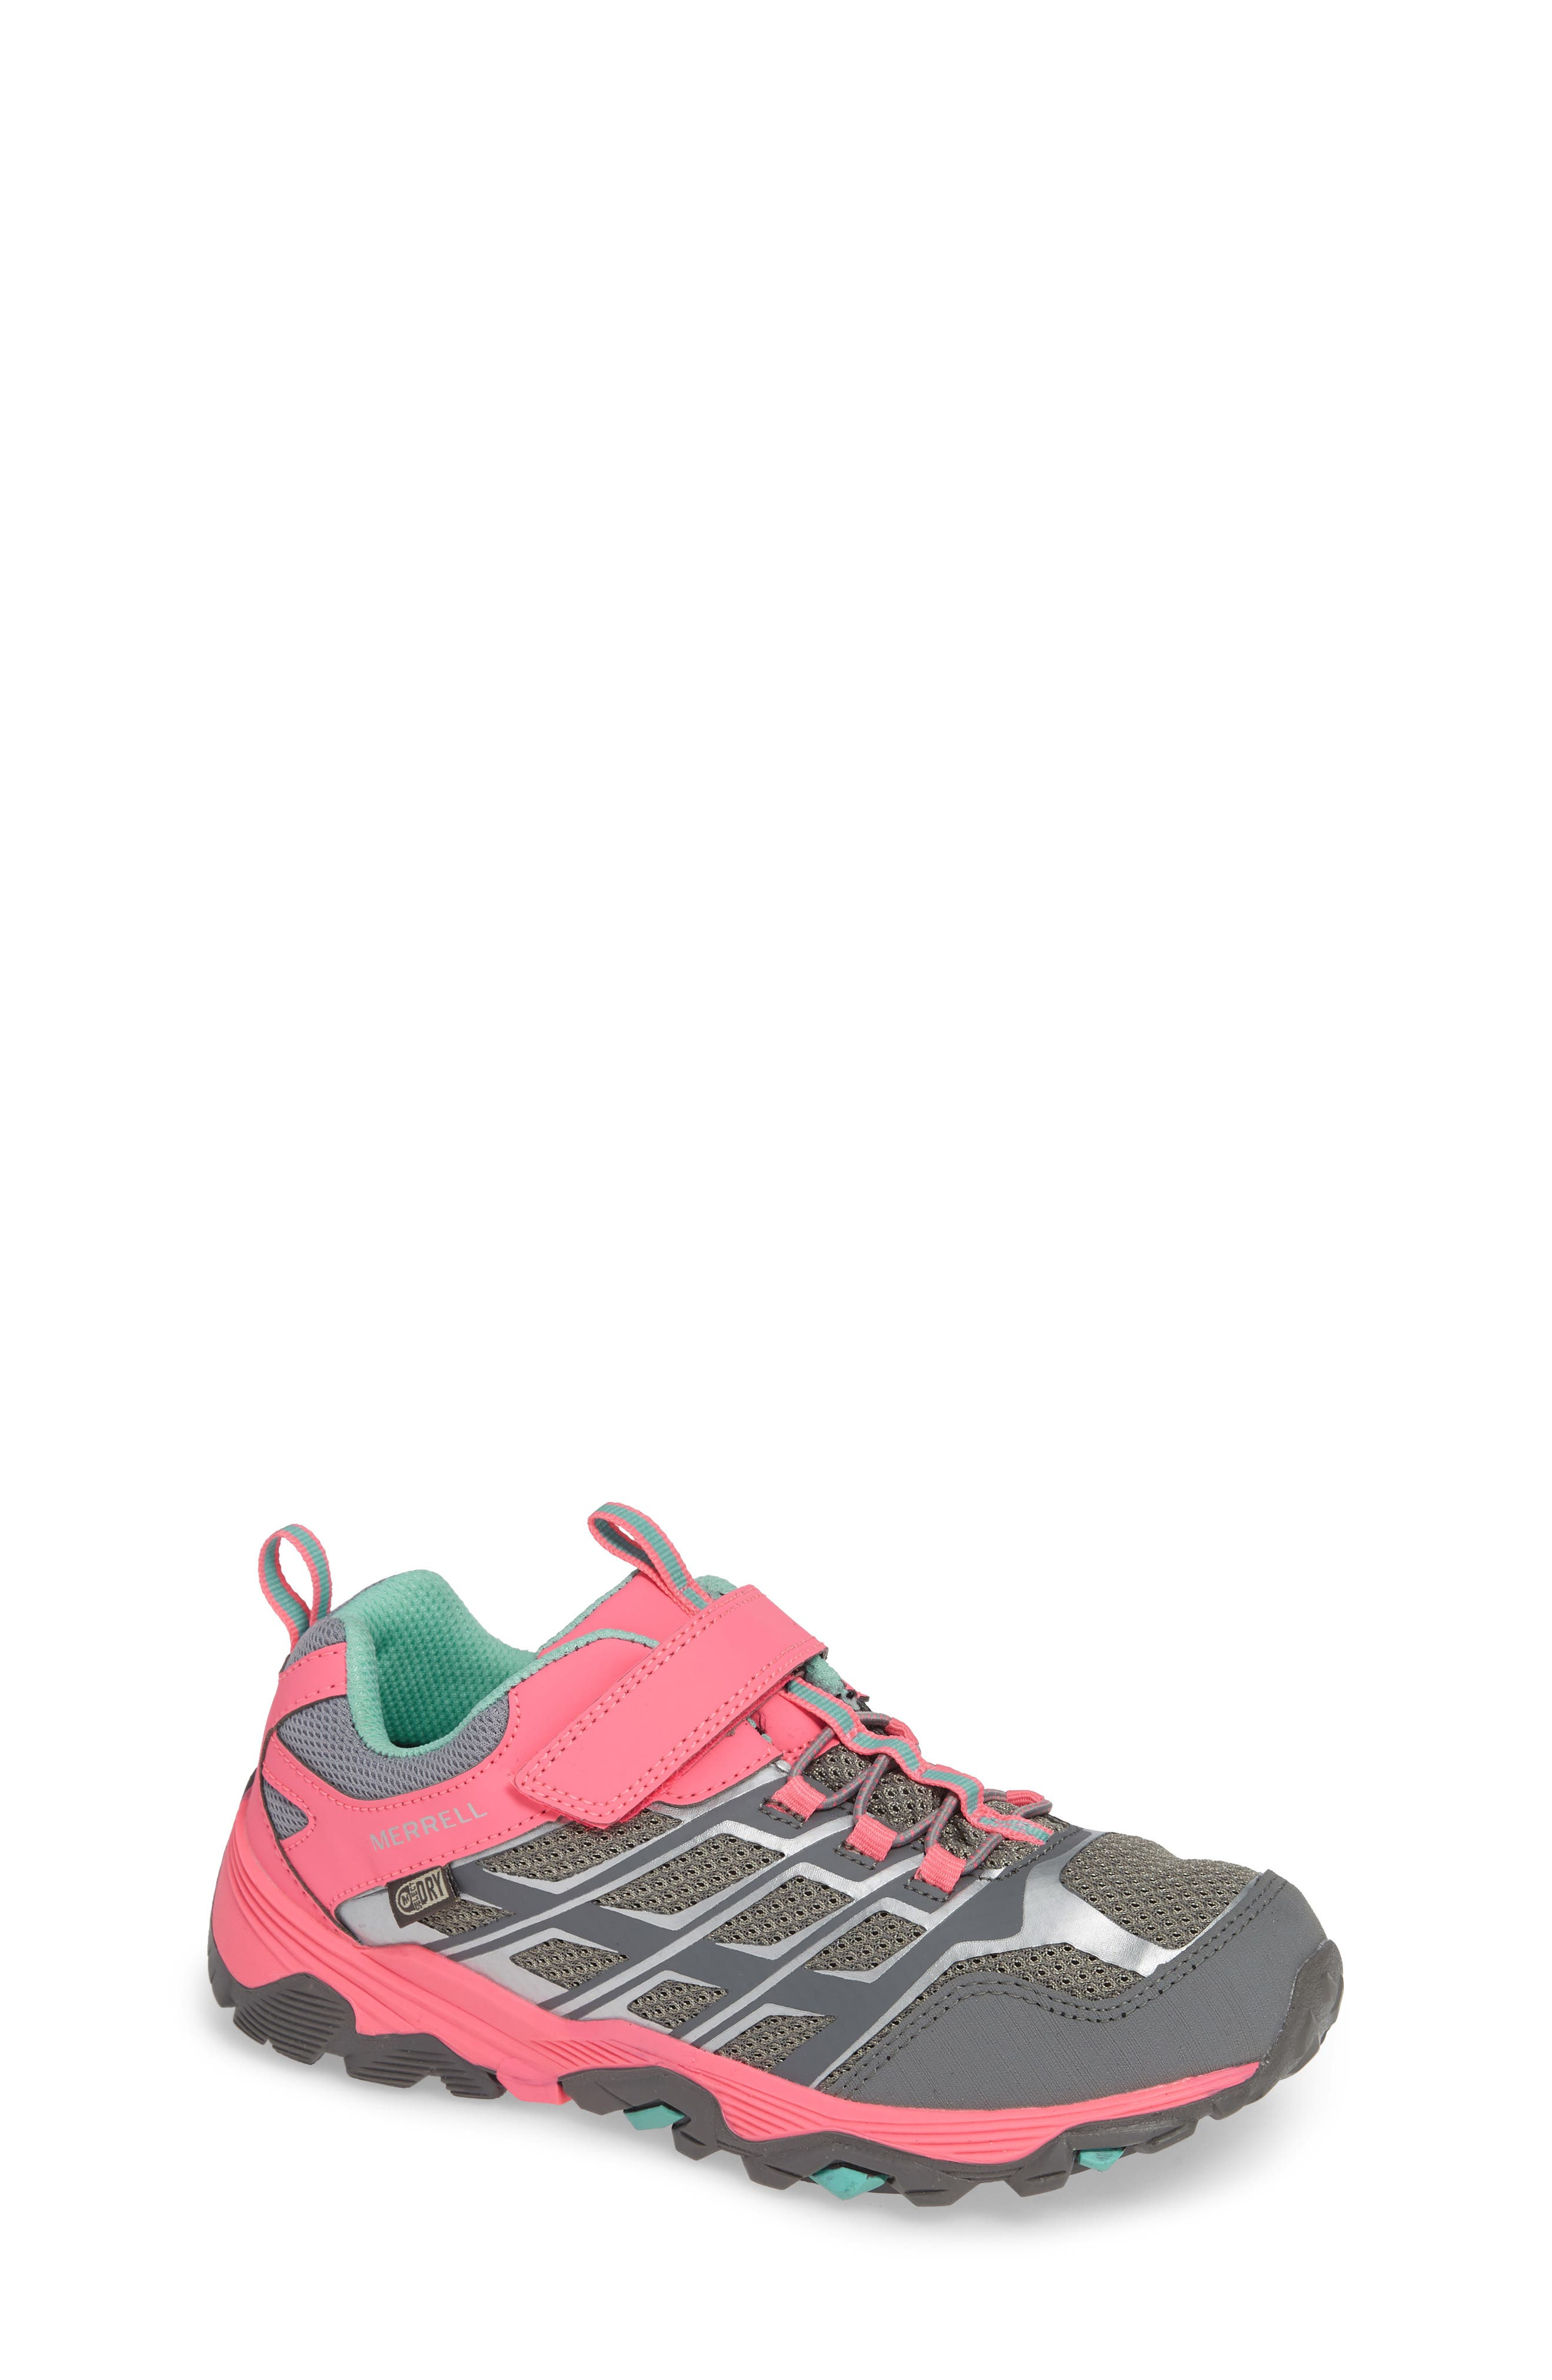 Moab FST Polar Low Waterproof Sneaker,                             Main thumbnail 1, color,                             GREY/ CORAL